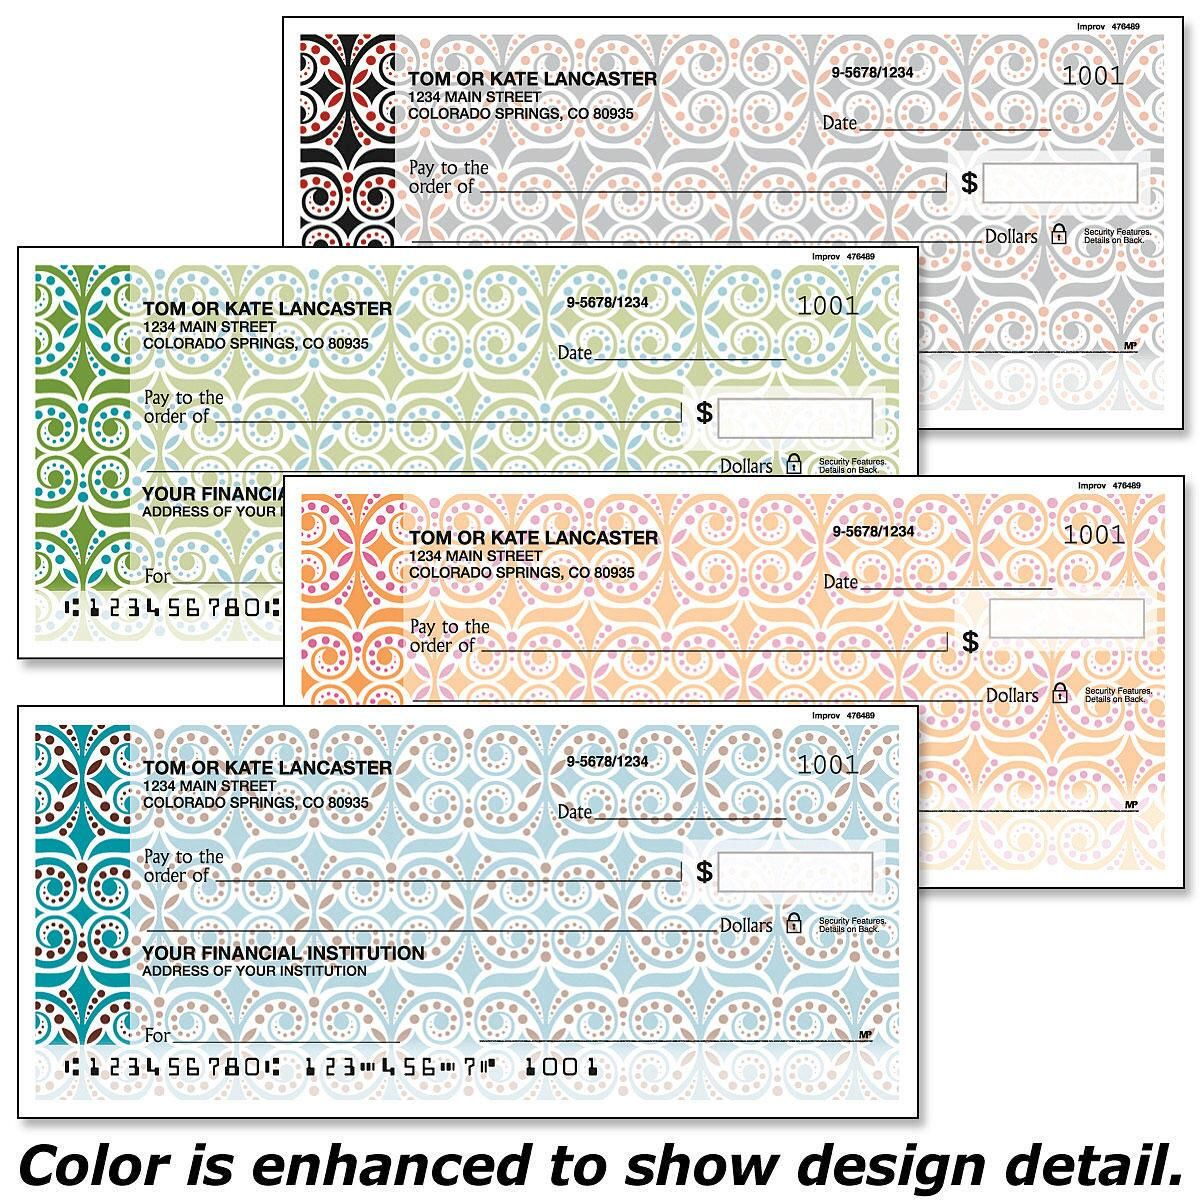 Improv Personal Checks